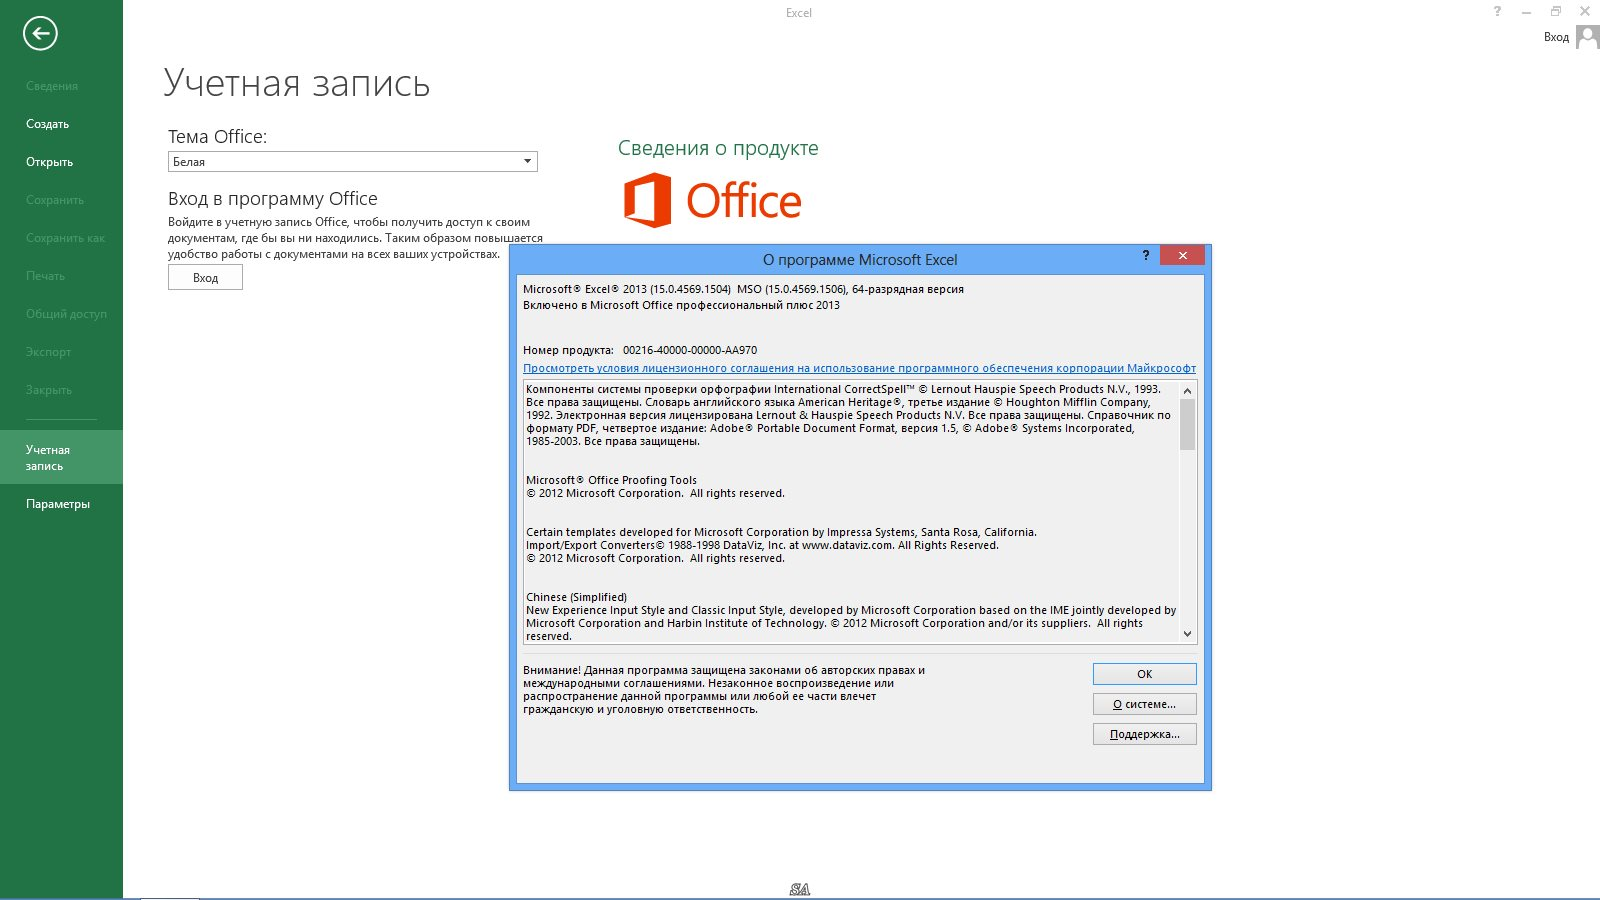 microsoft office professional plus 2013 sp1 15.0